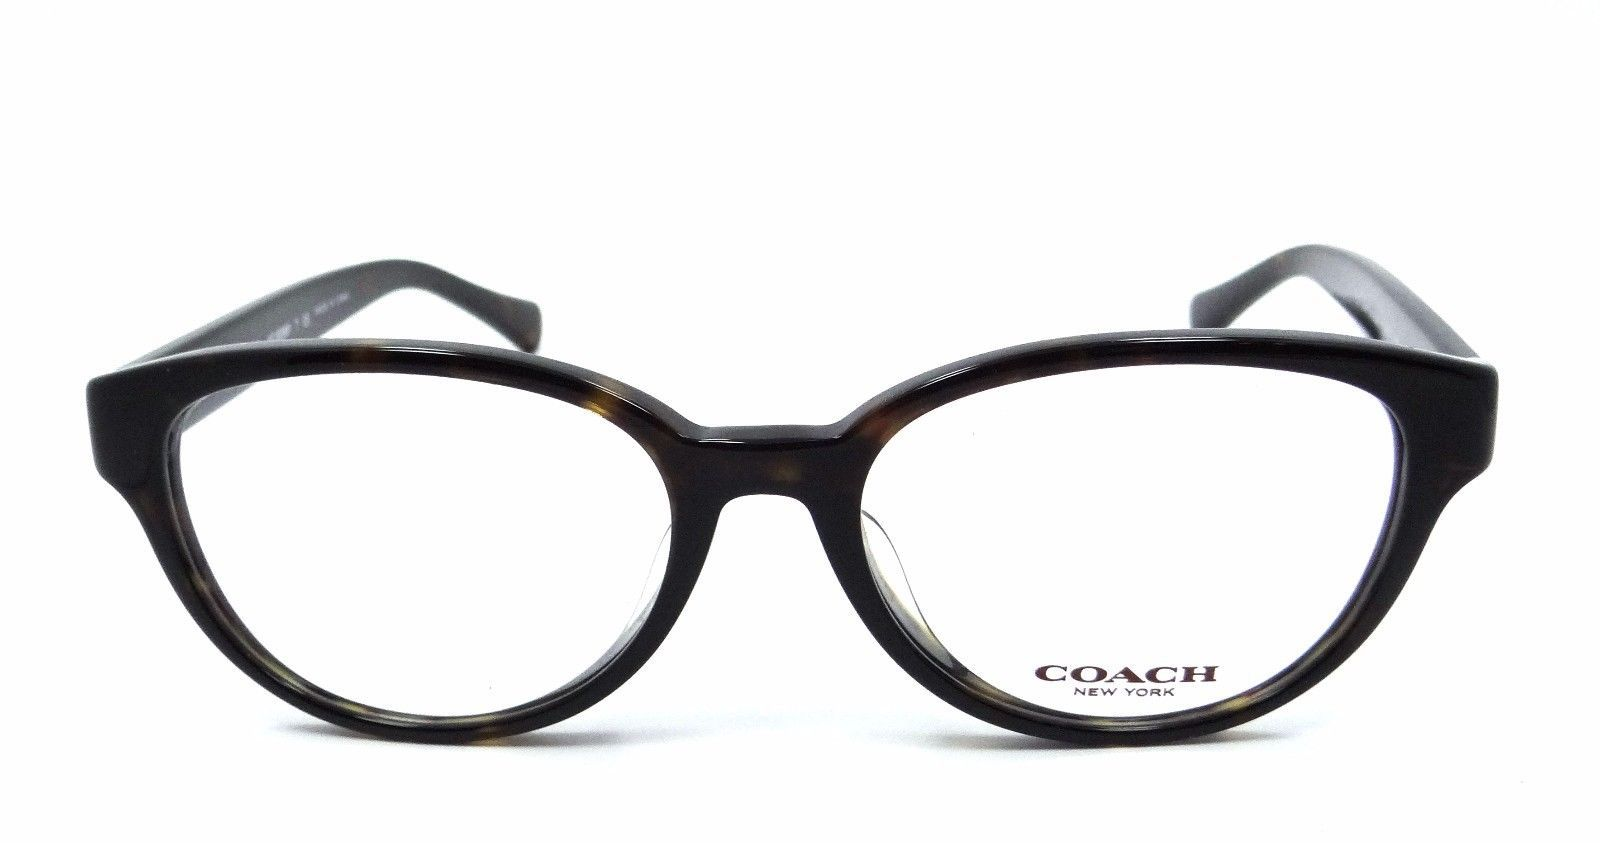 Authentic Coach Rx Eyeglasses Frames HC 6069F 5120 53x17 Dark Tortoise Asian Fit